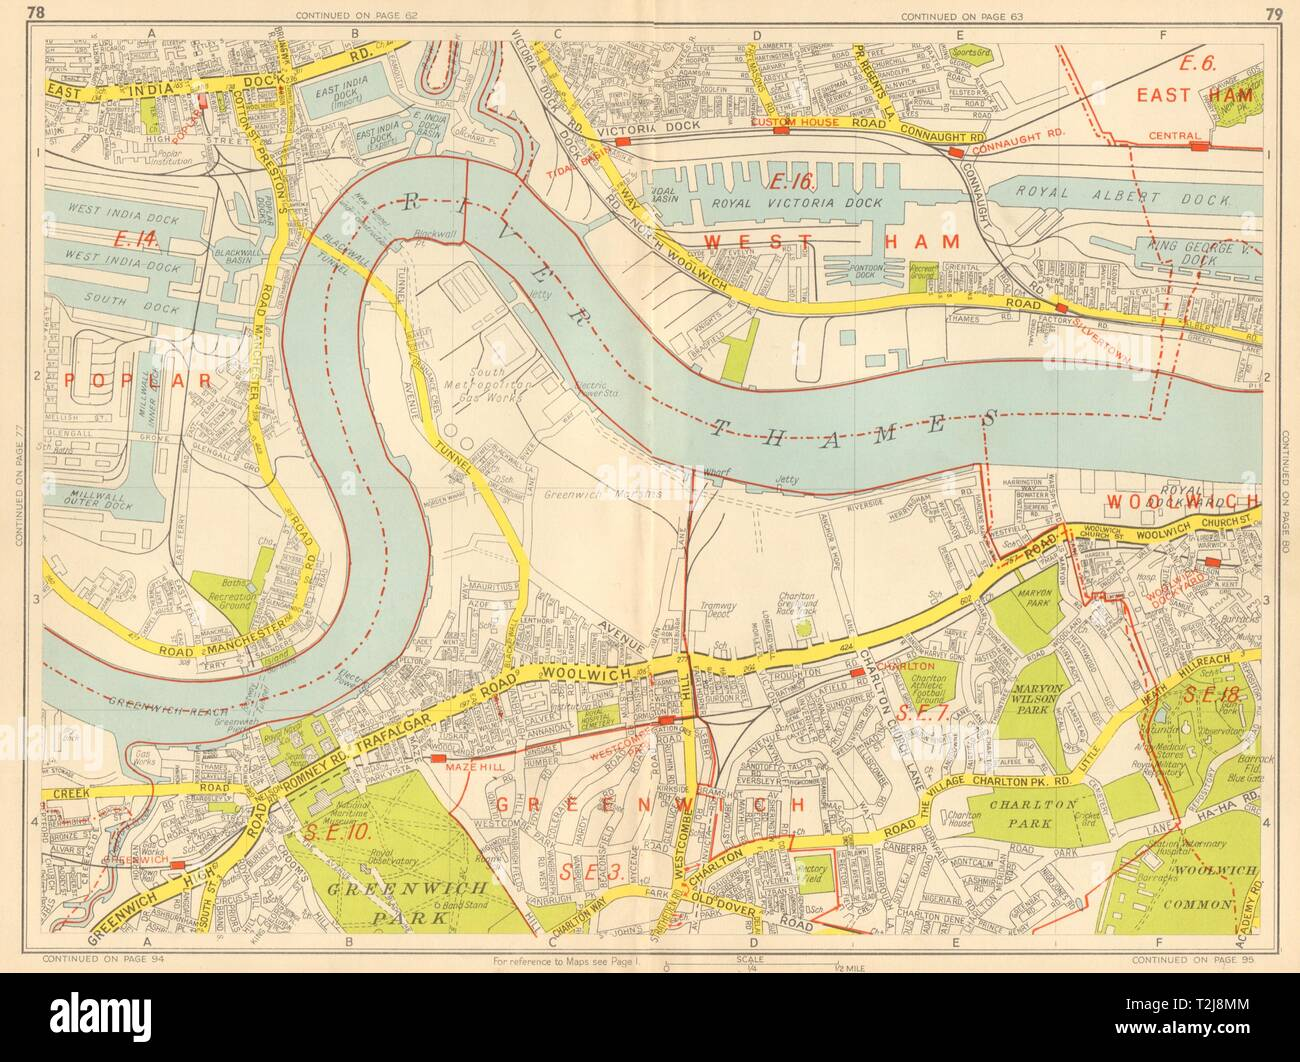 GEOGRAPHERS/' A-Z 1956 map GREENWICH Isle of Dogs Woolwich Charlton Royal Docks